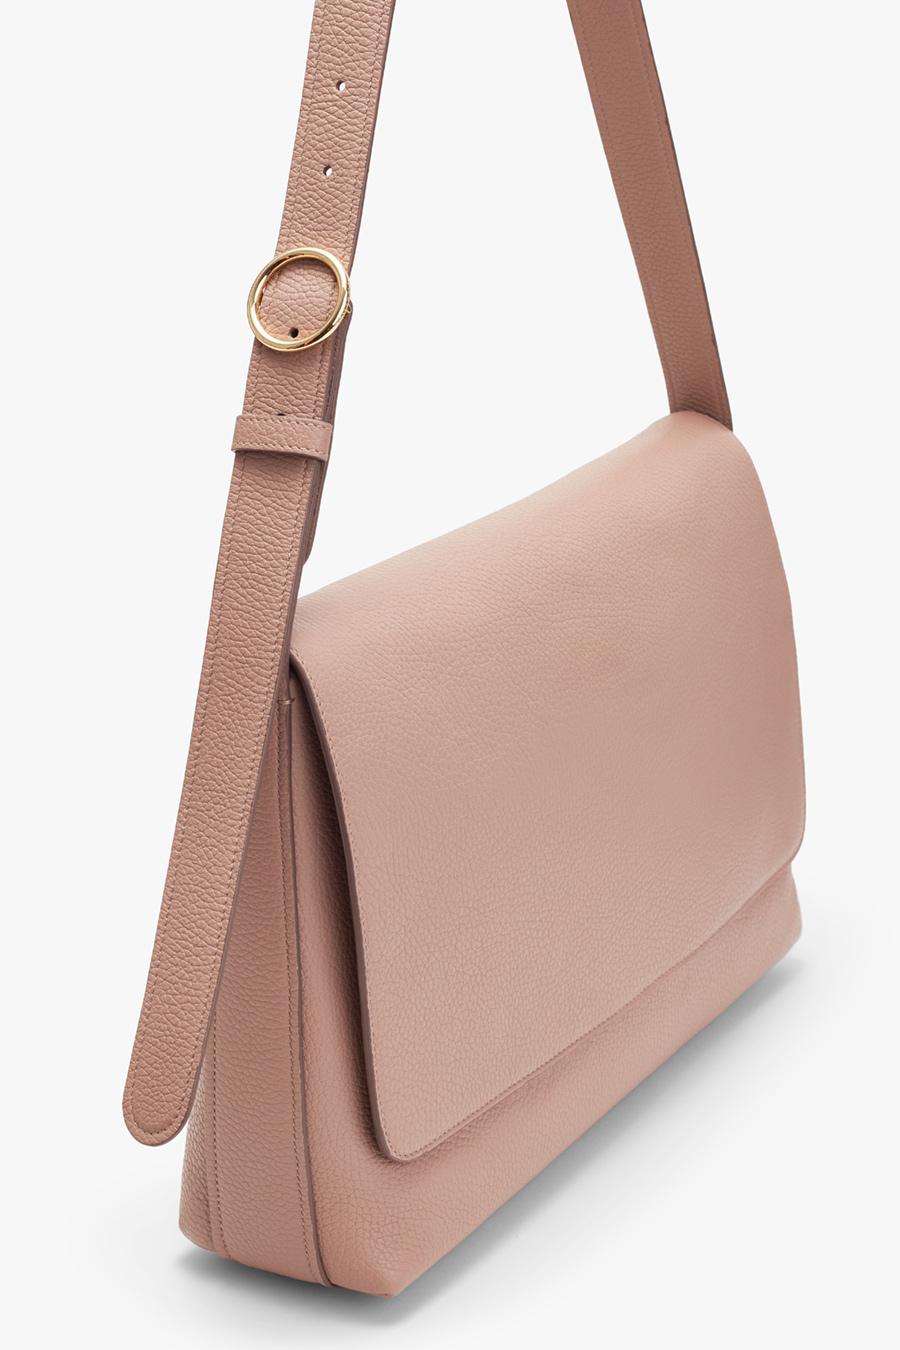 Judascepeda Messenger Shoulder Bag Trees in Bird Garden Strap Laptop Bag for Men Women 13 Inch